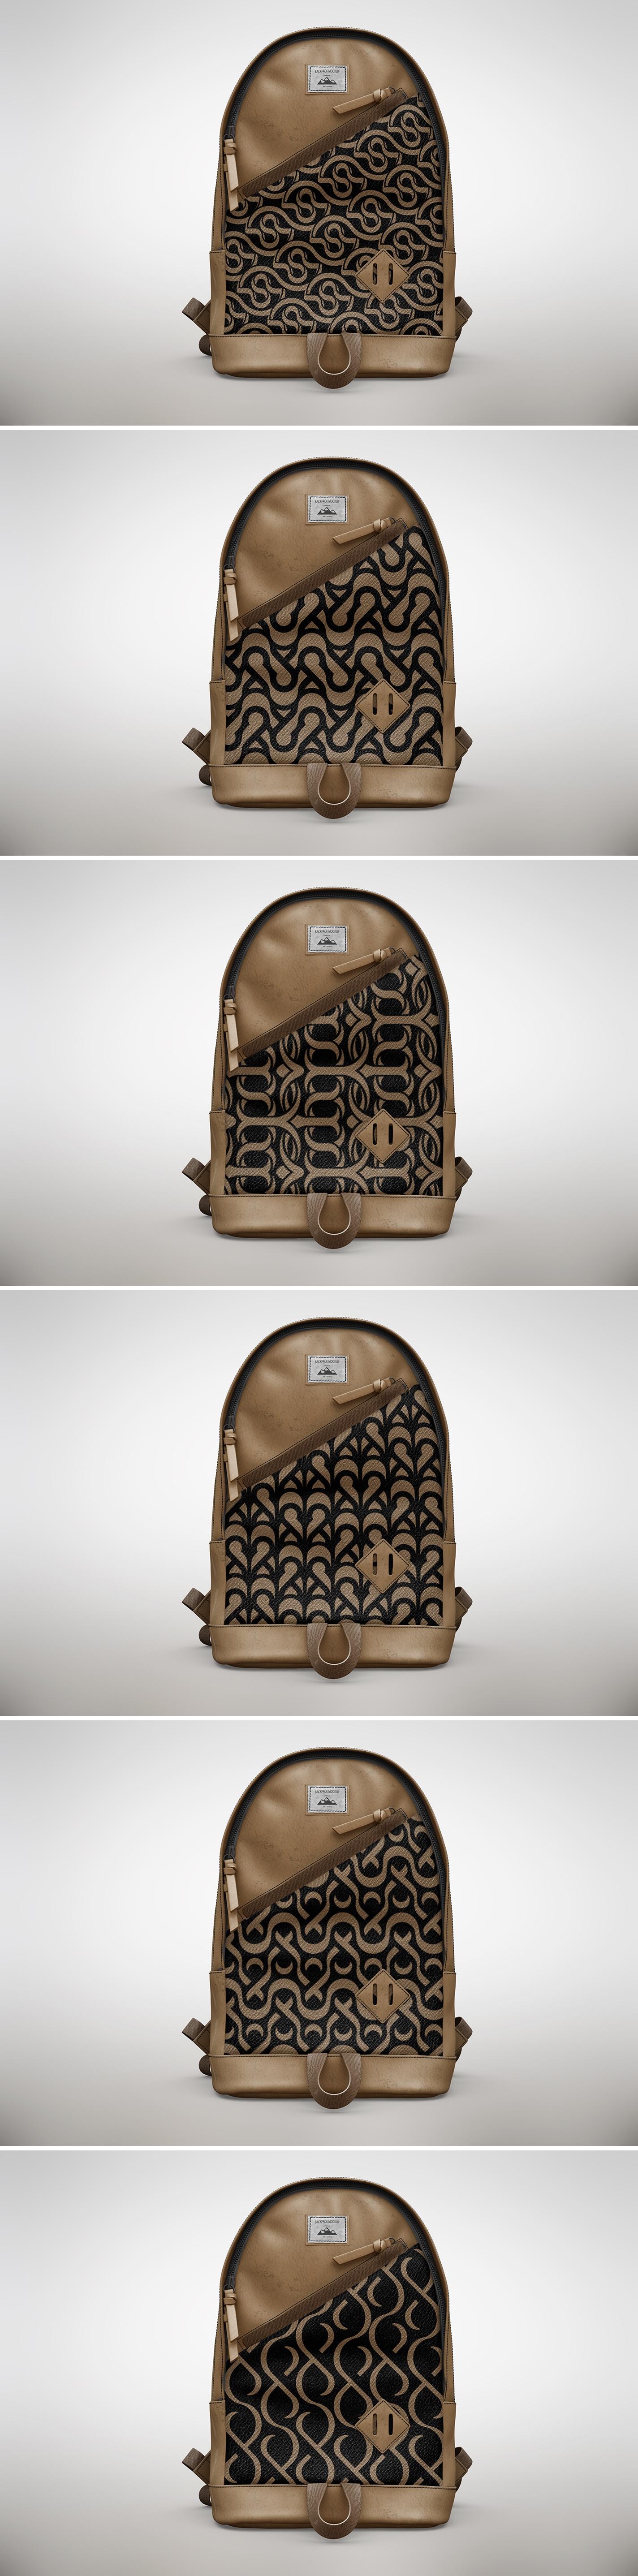 Конкурс на создание оригинального принта для рюкзаков фото f_2955f871310dbd52.jpg